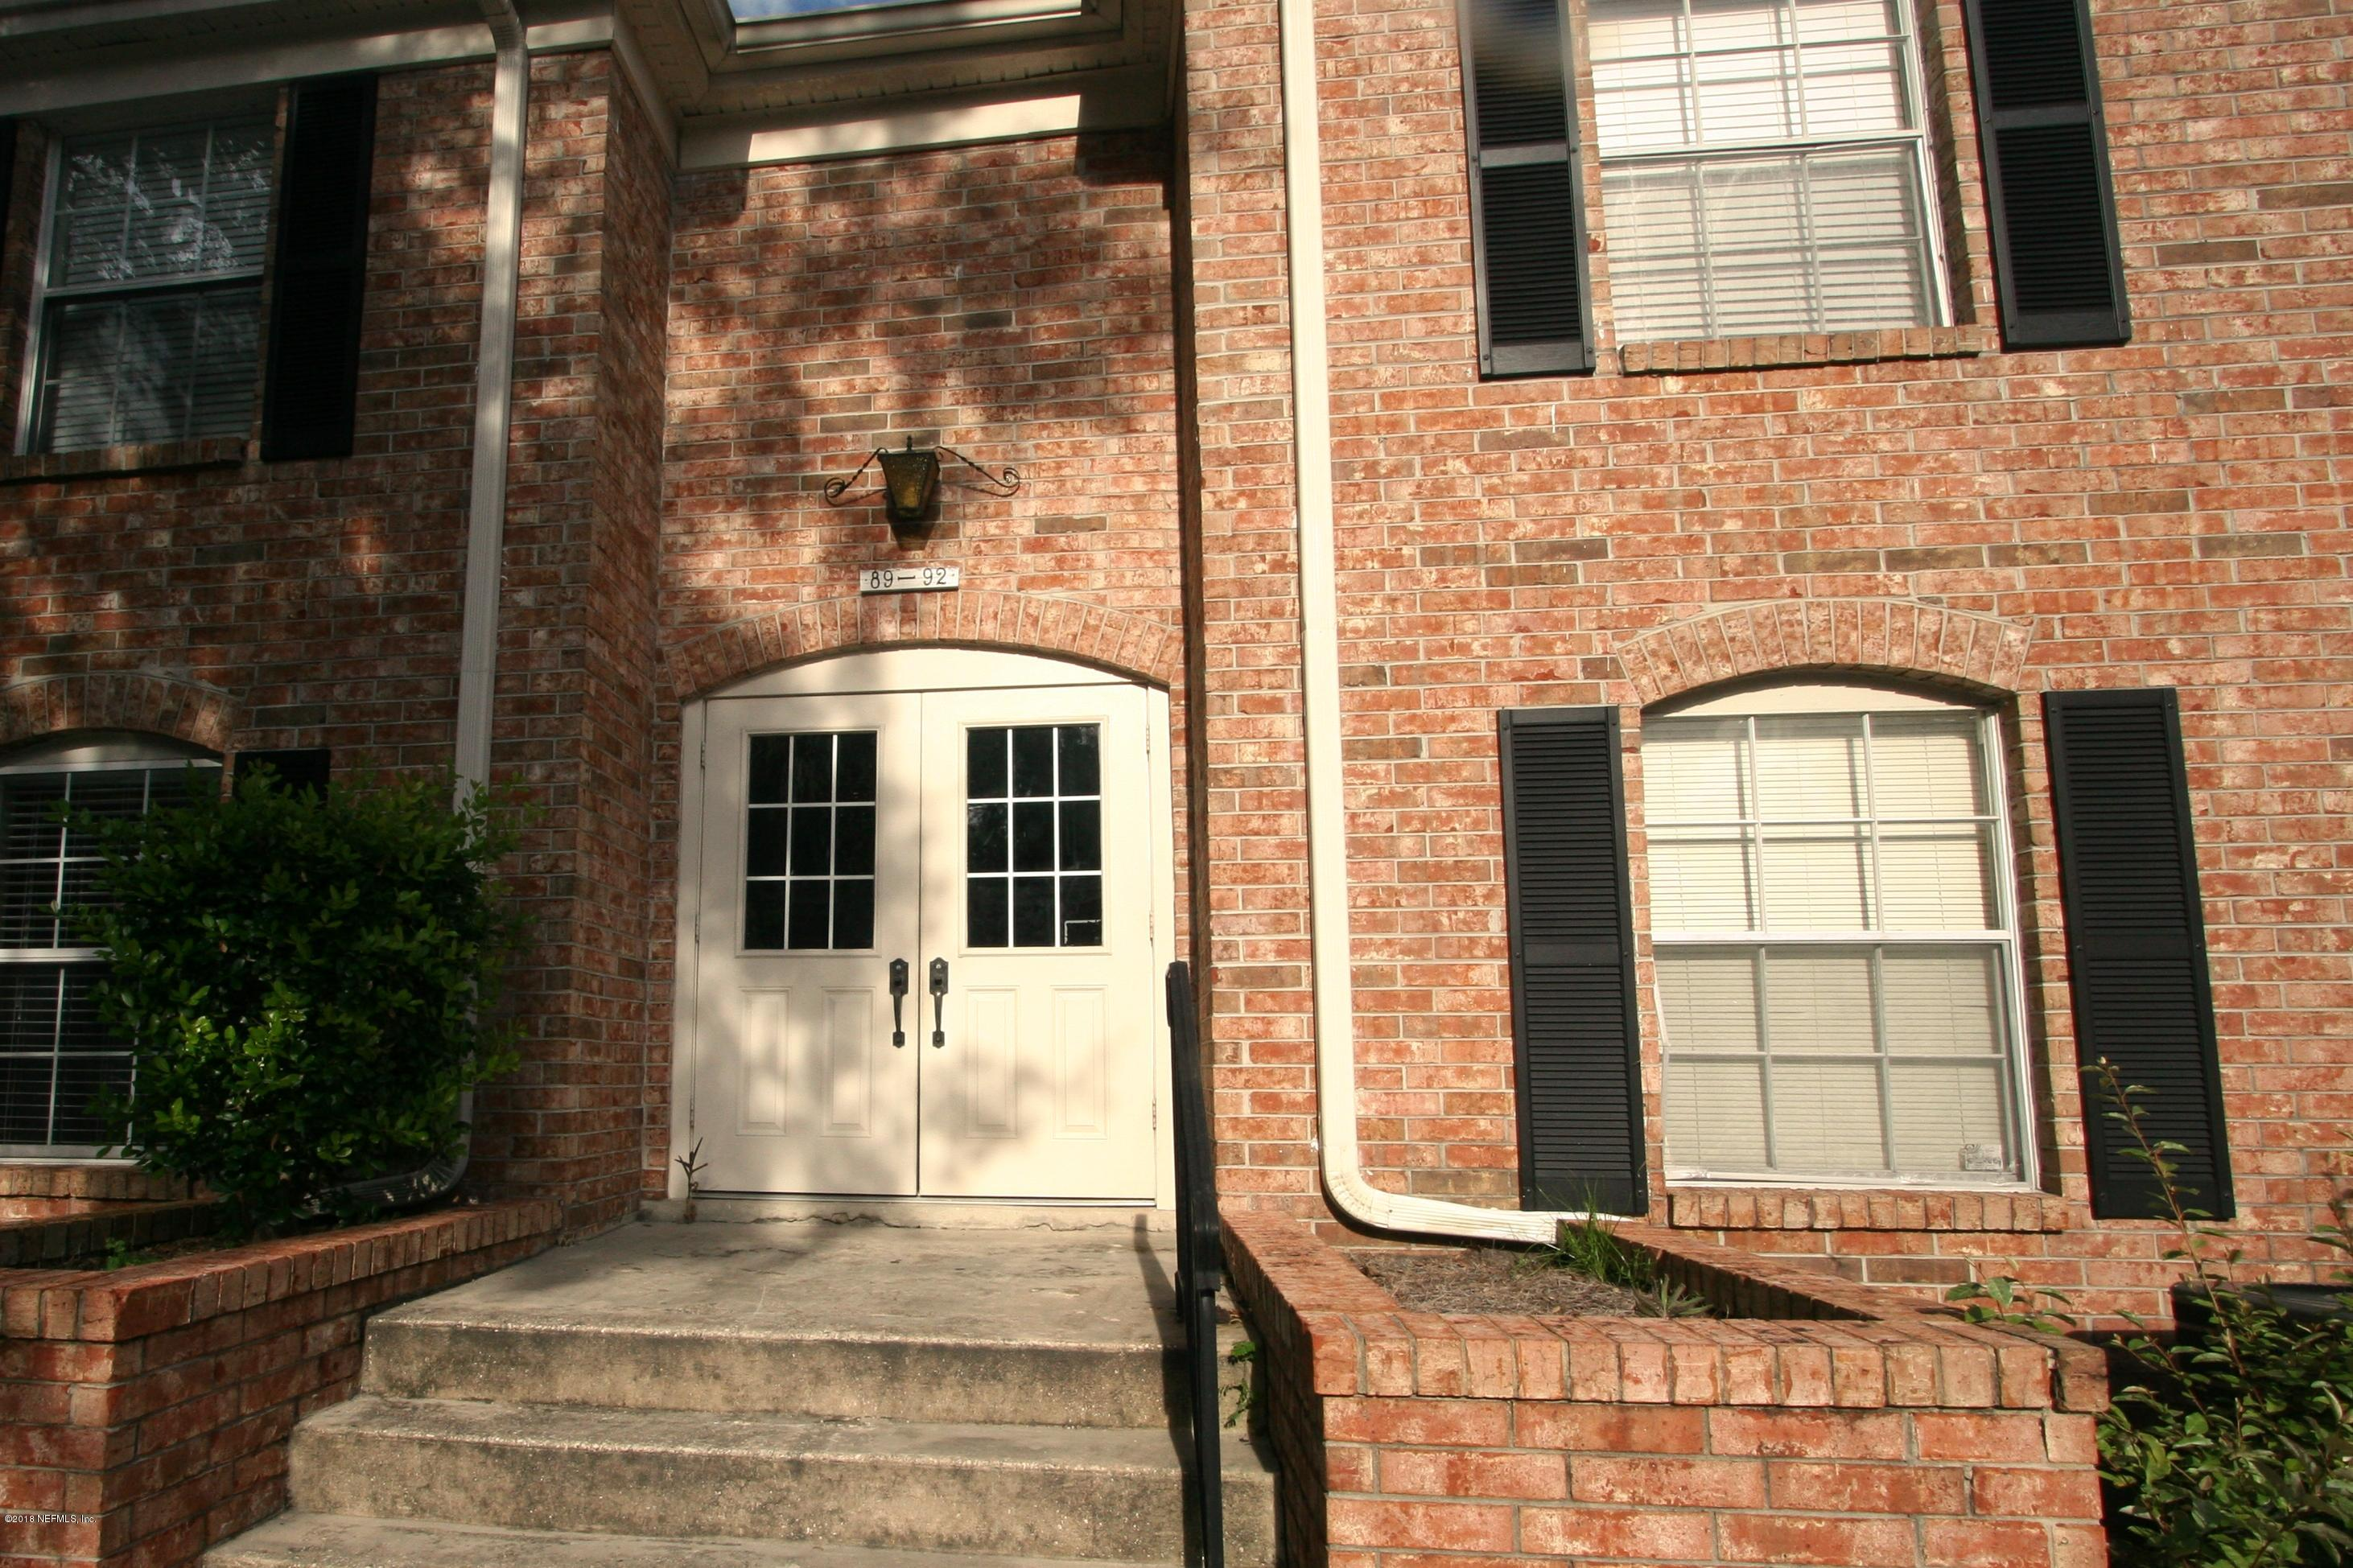 5201 ATLANTIC, JACKSONVILLE, FLORIDA 32207, 2 Bedrooms Bedrooms, ,2 BathroomsBathrooms,Residential - condos/townhomes,For sale,ATLANTIC,962869